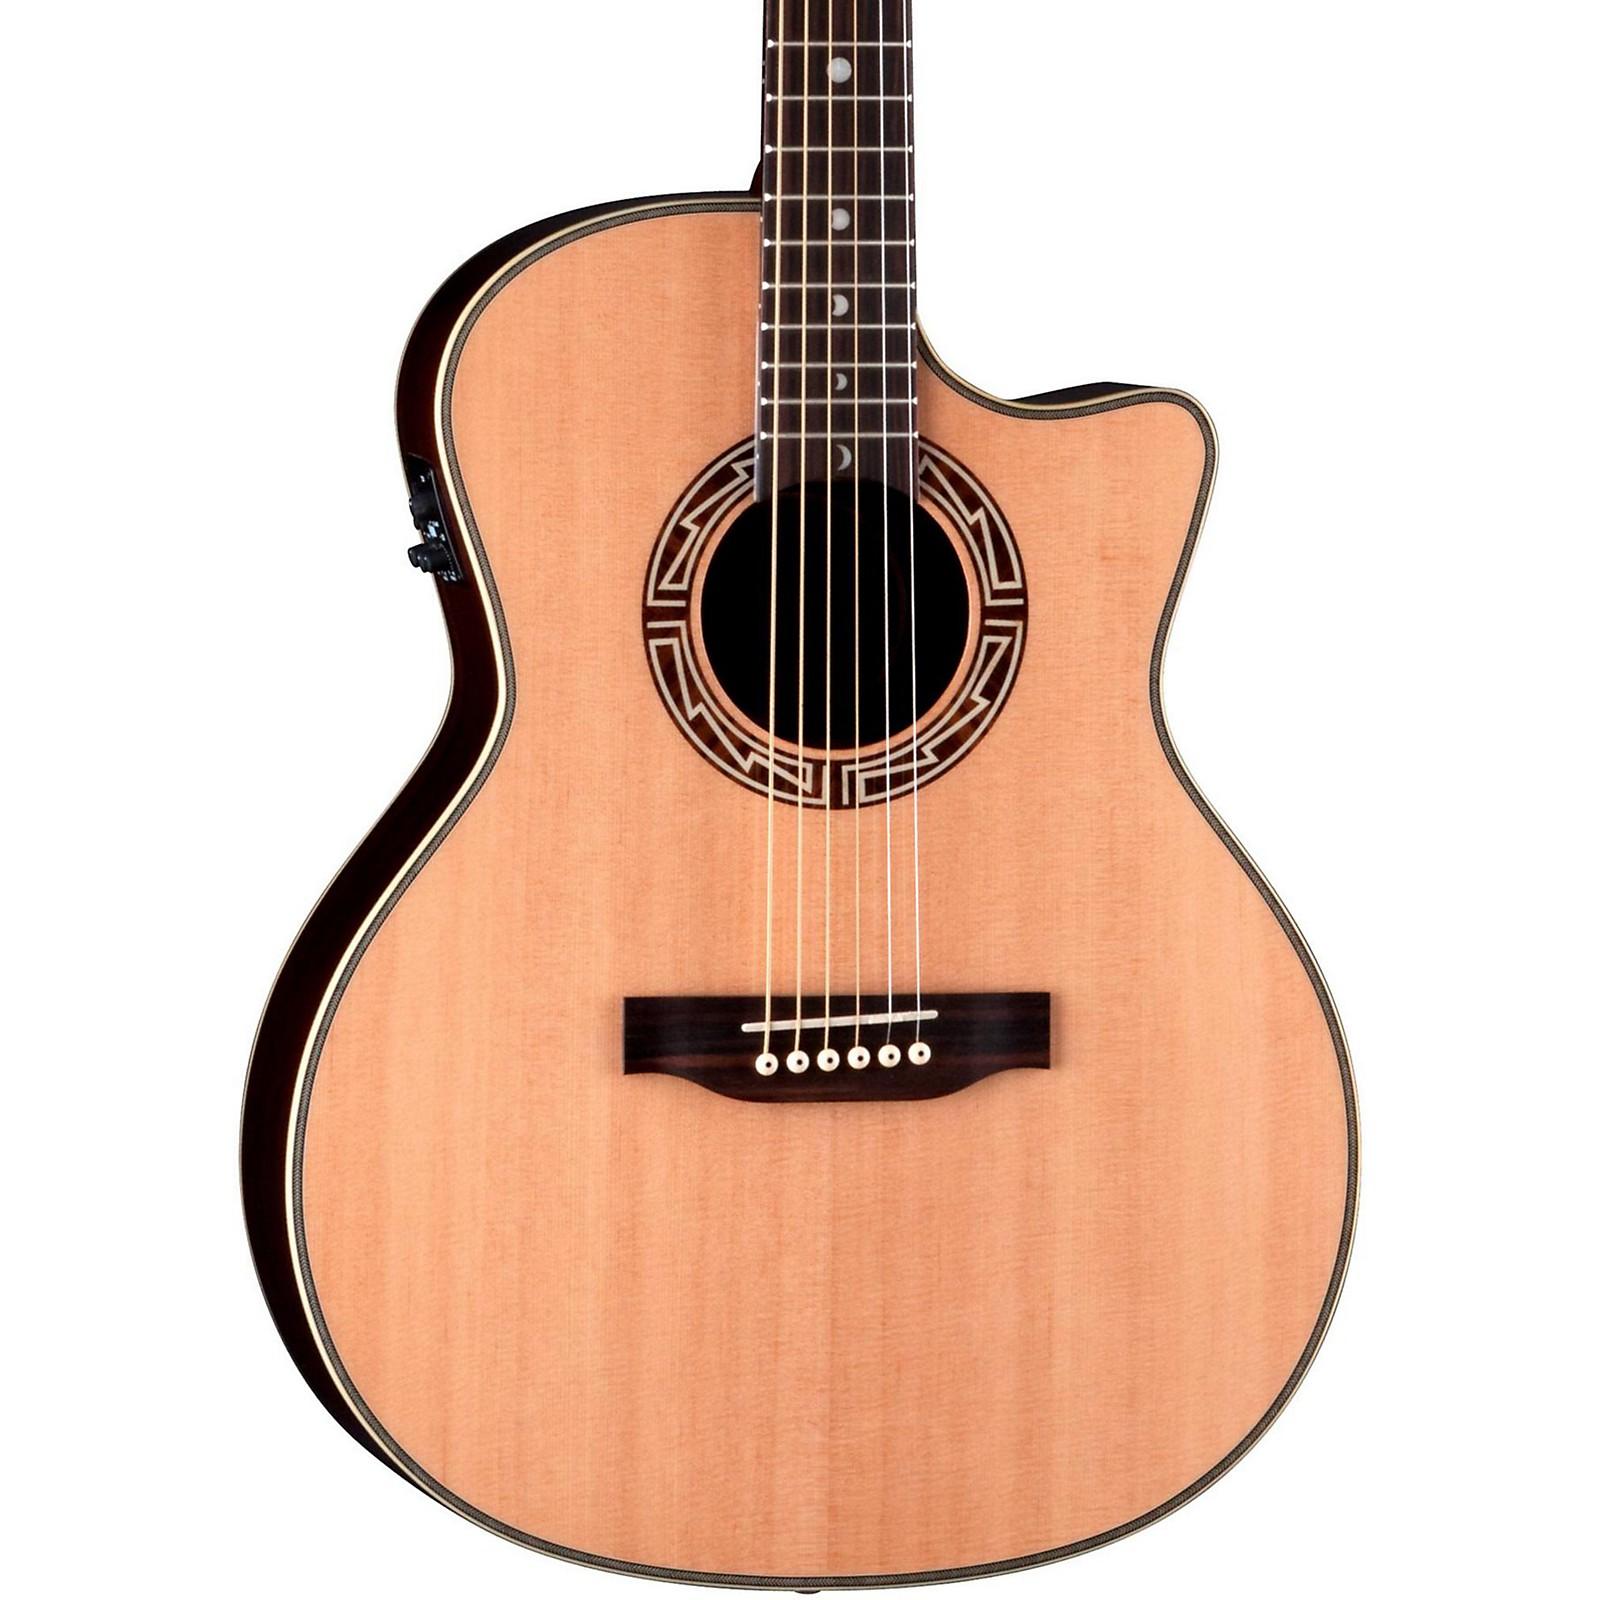 New Luna Guitars AMP 100 Americana Parlor Cutaway w/ BBand